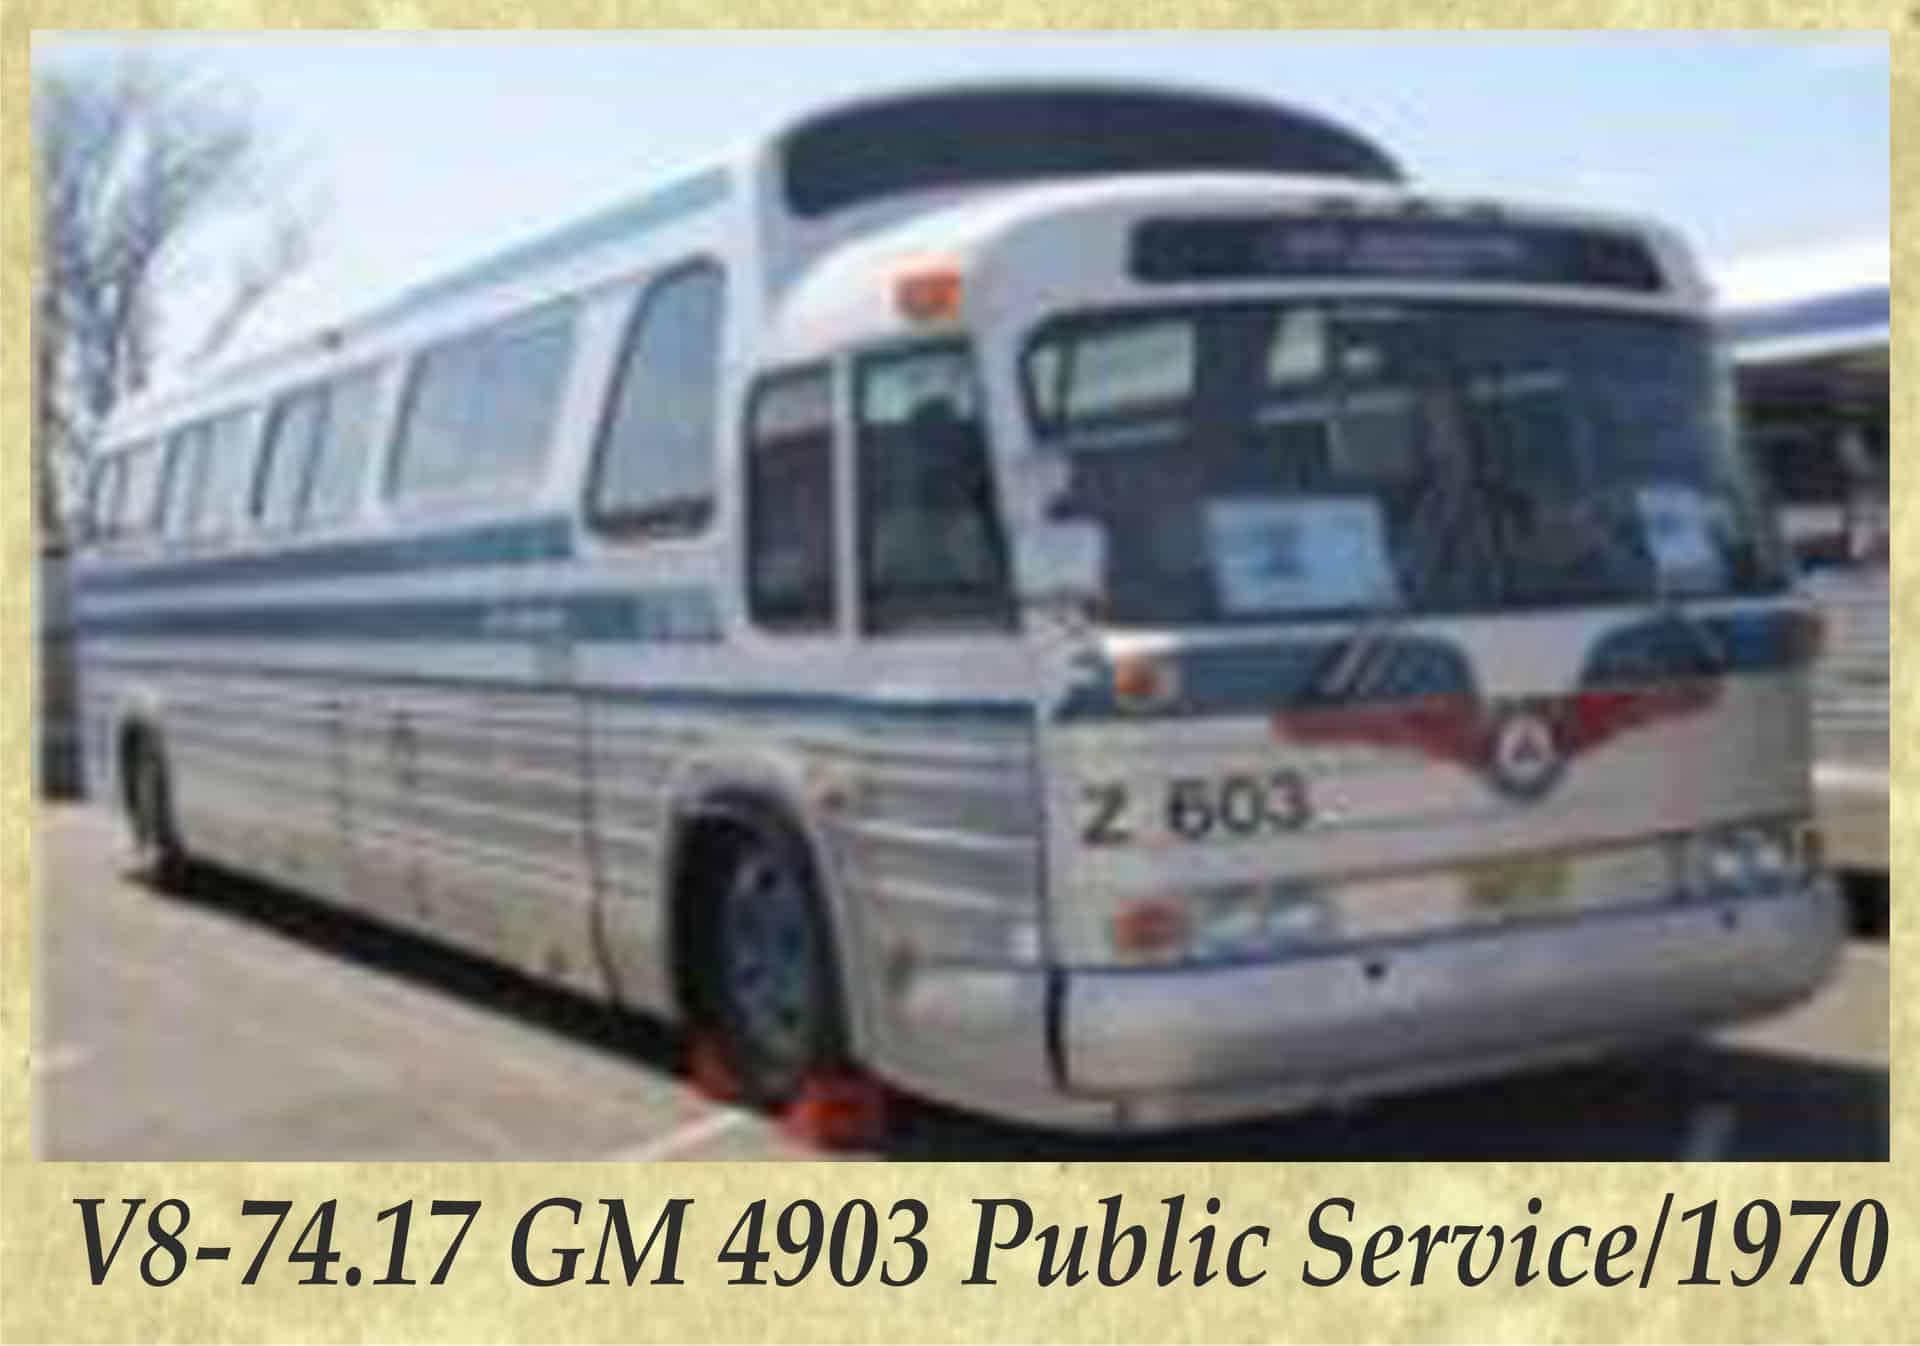 V8-74.17 GM 4903 Public Service 1970